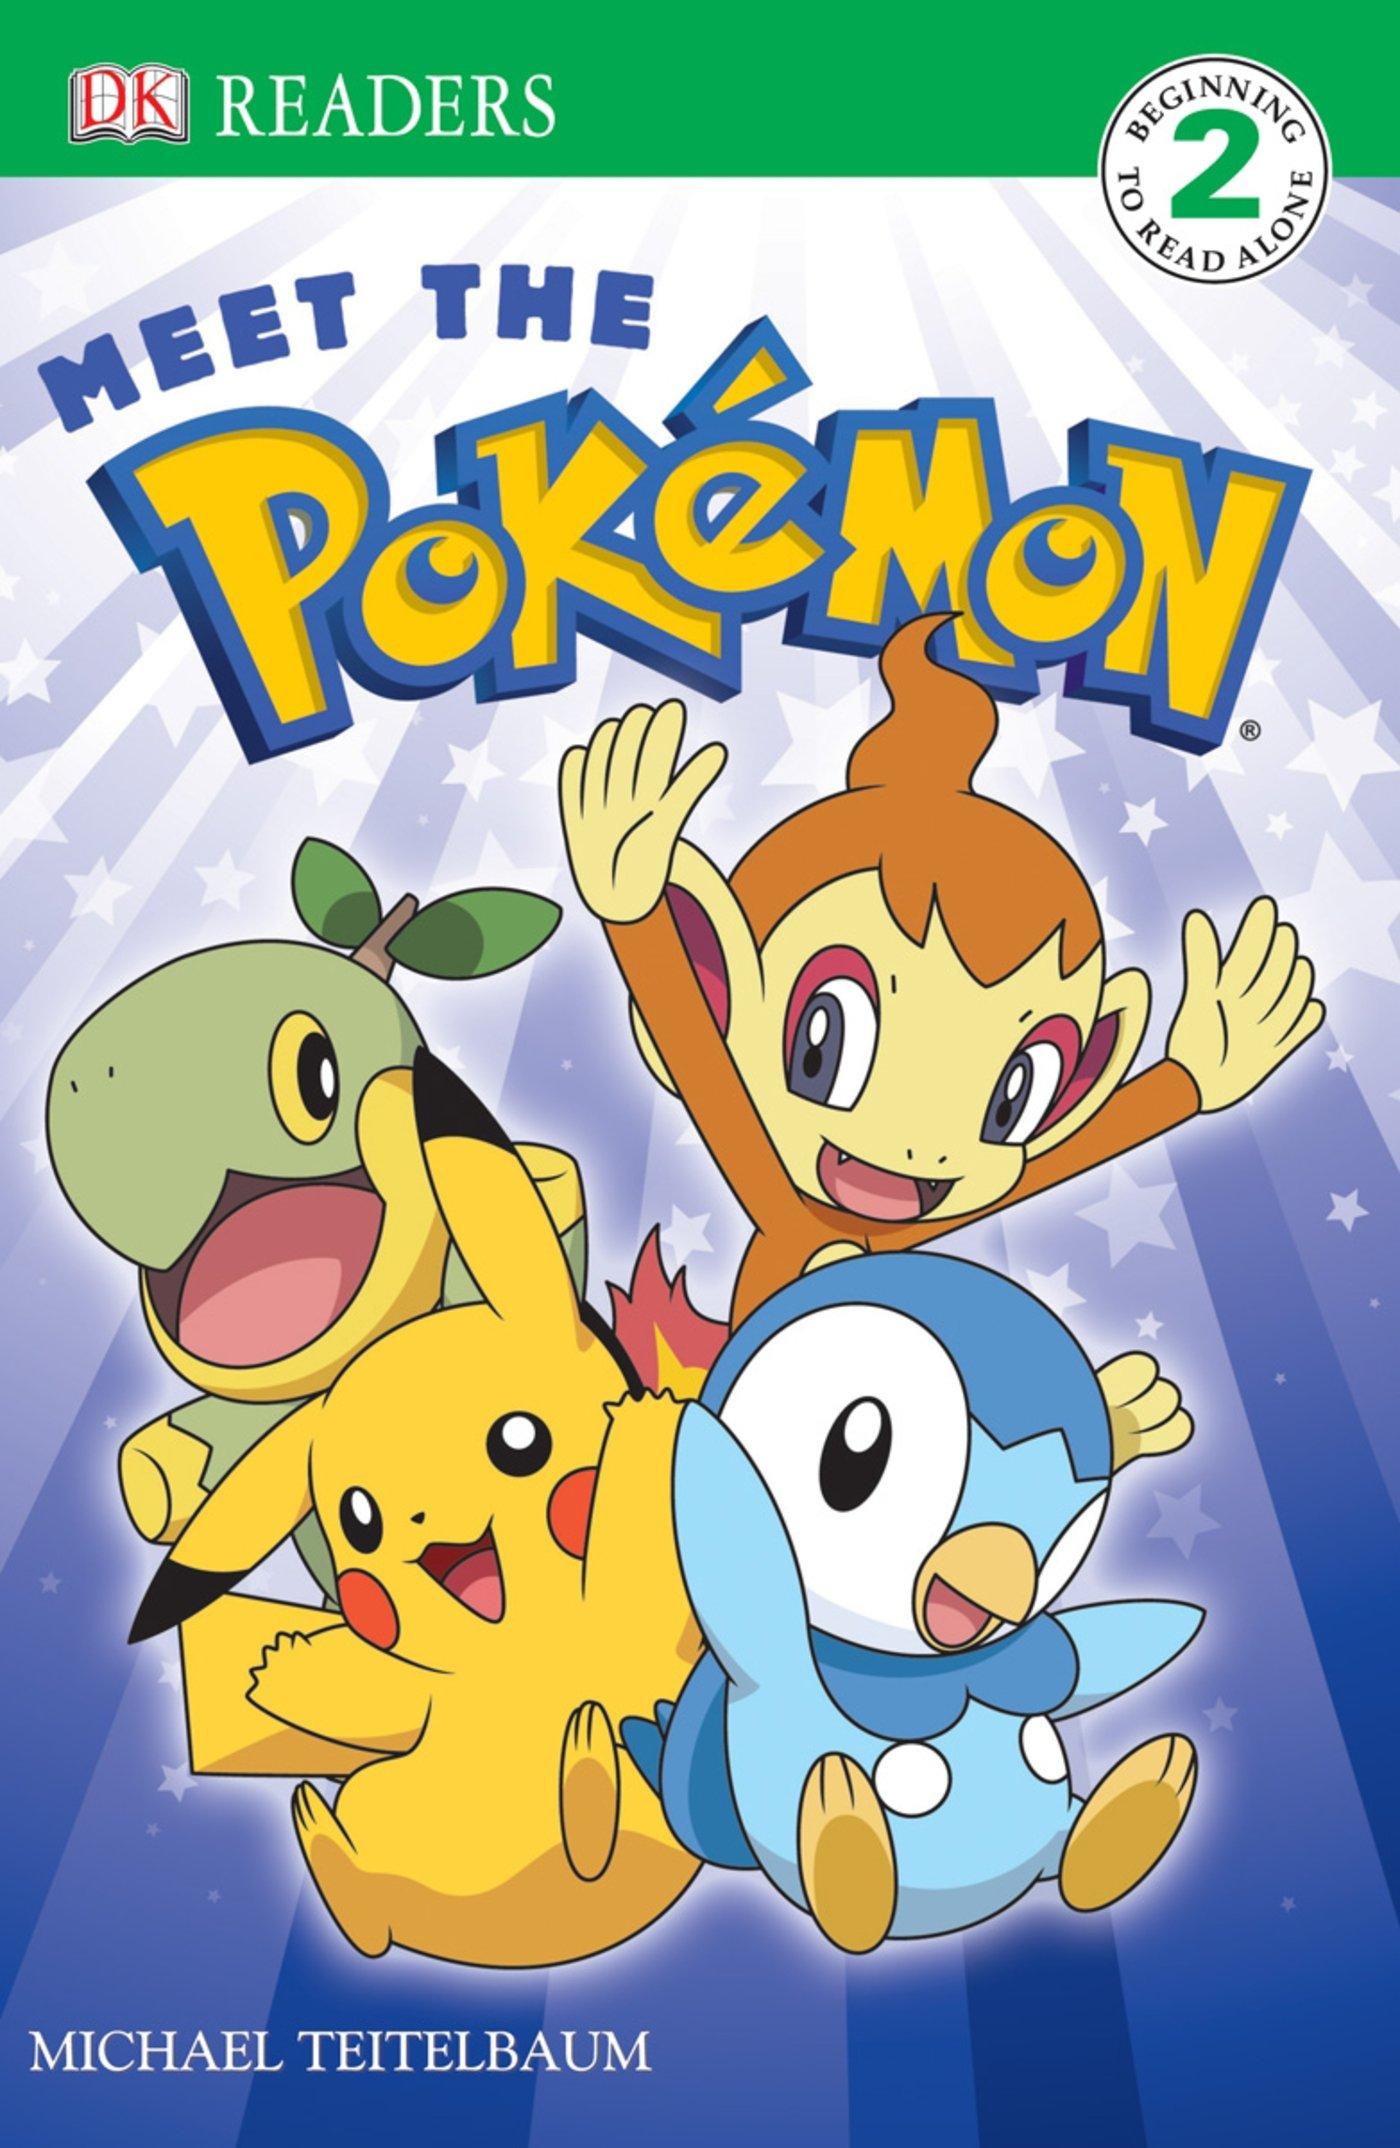 Meet the Pokemon (DK Readers, Level 2) ebook